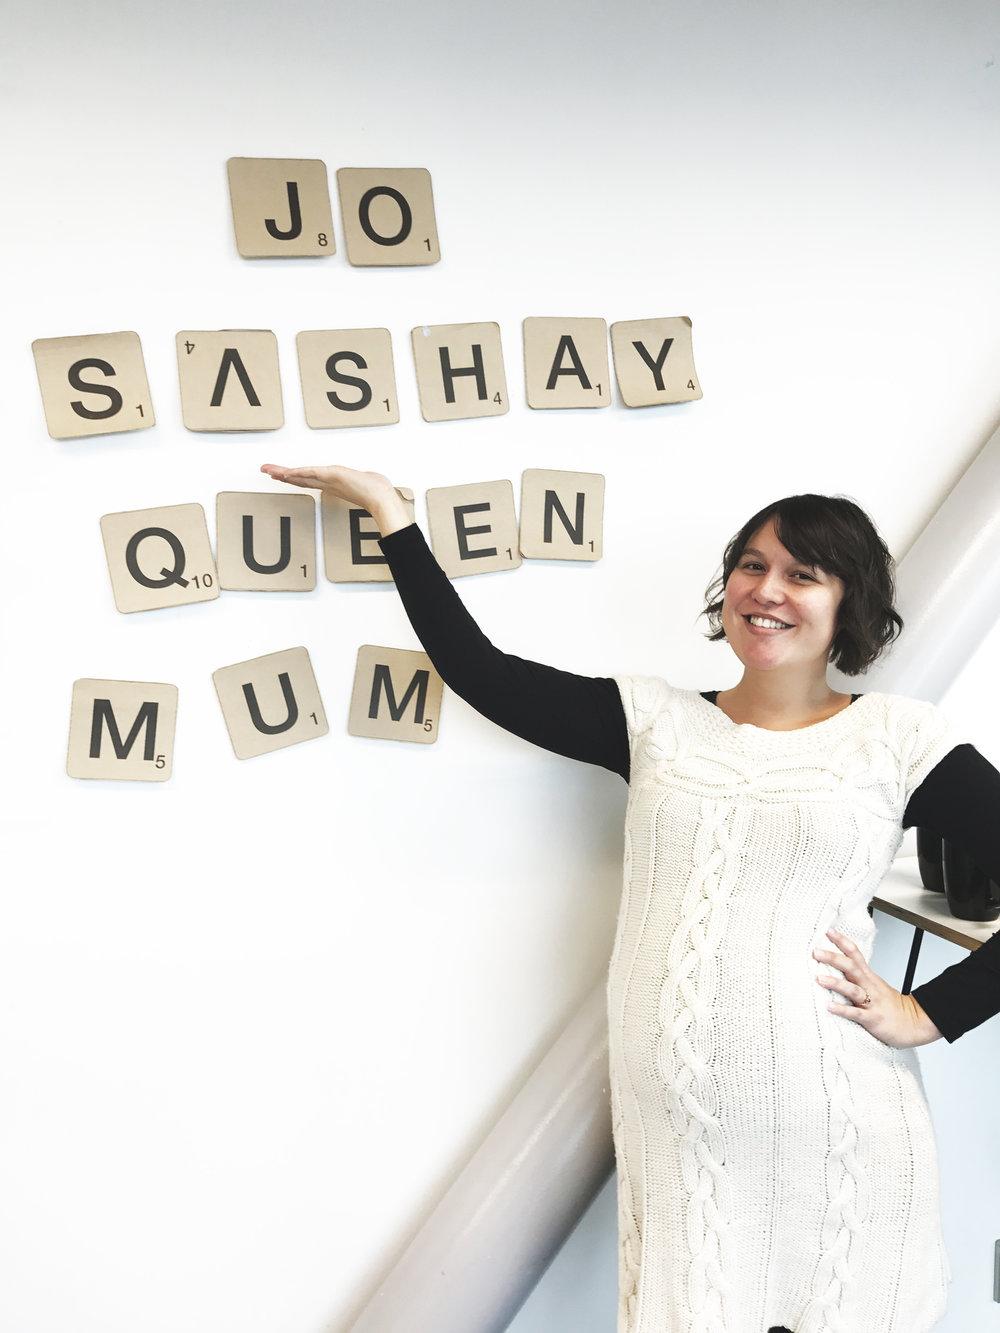 Jo, sashay away